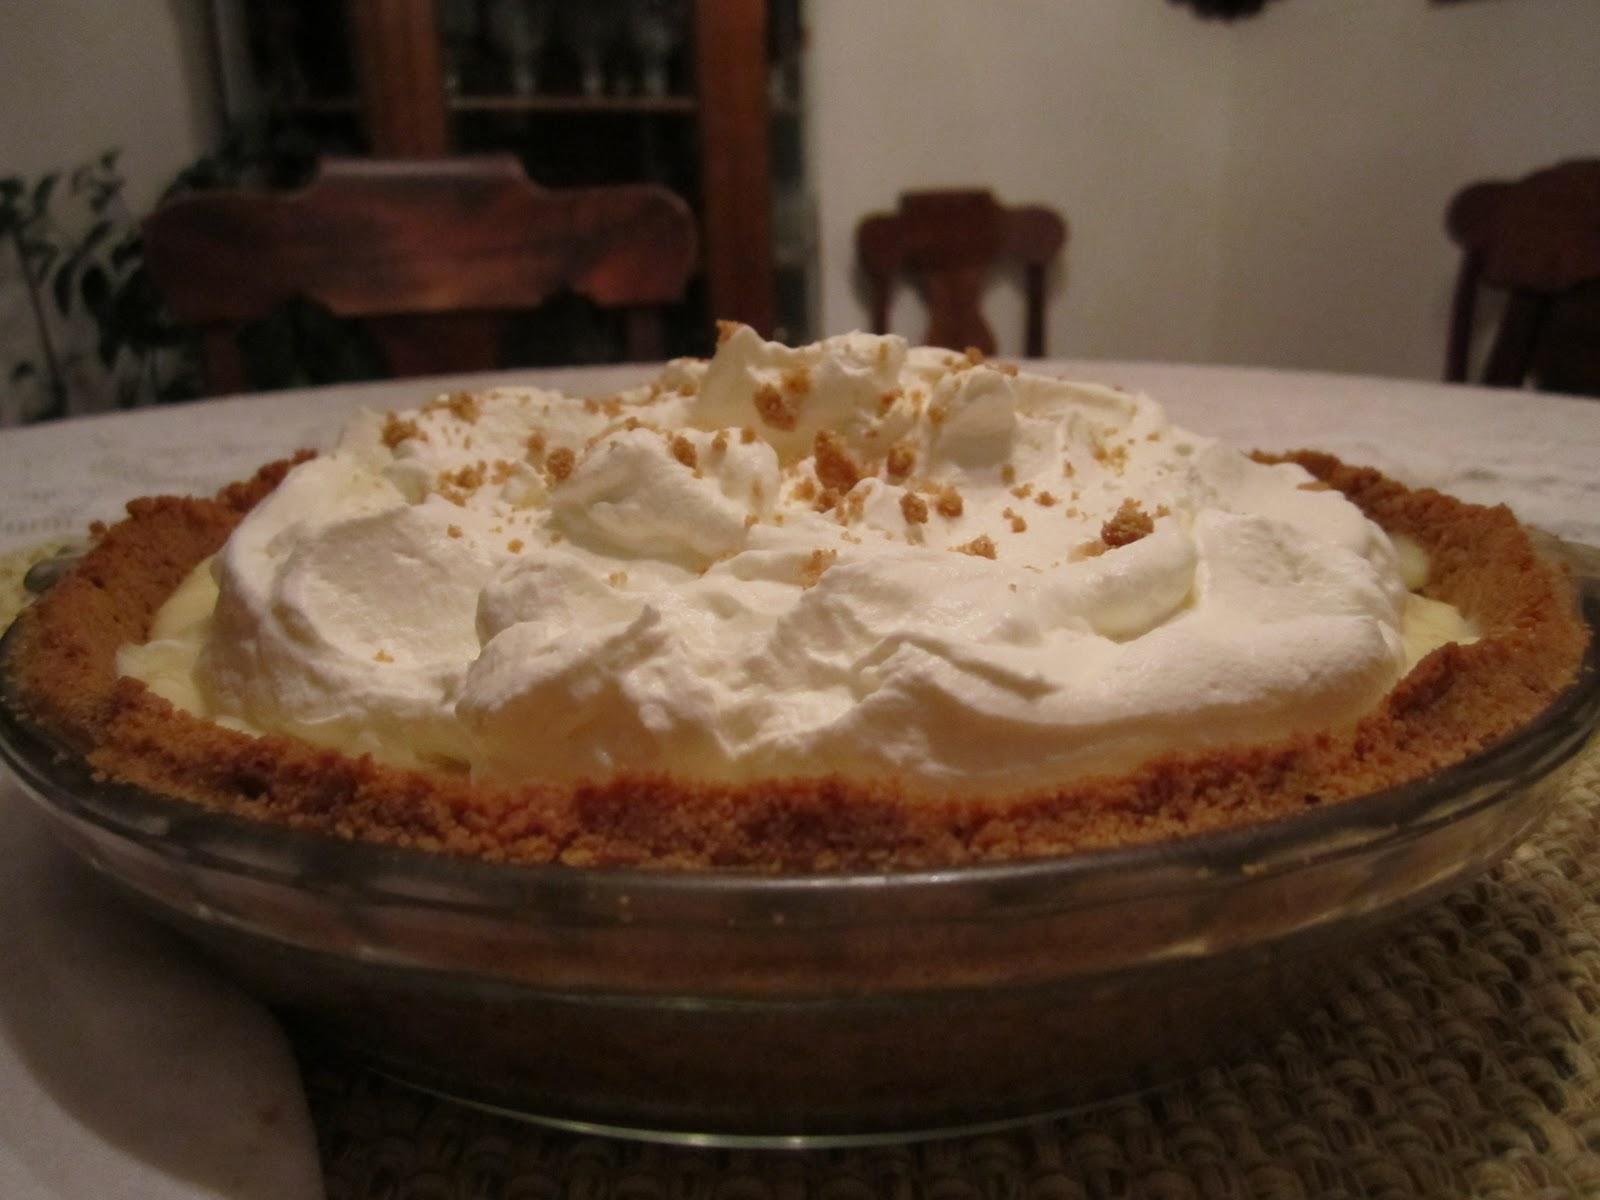 The Irish Mother: Banana Cream Pie with Bourbon Caramel Sauce